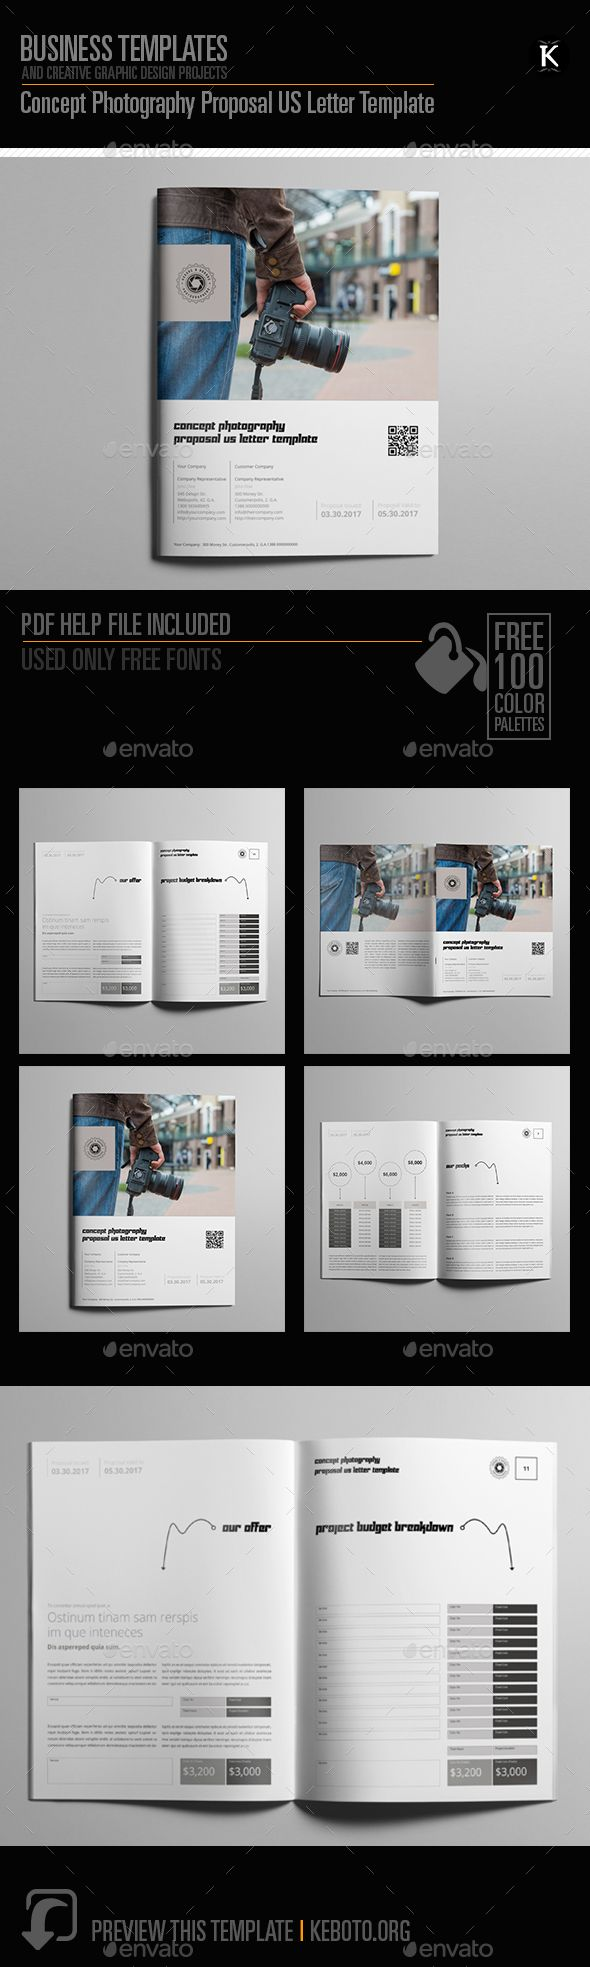 Concept Photography Proposal Us Letter Template Proposals